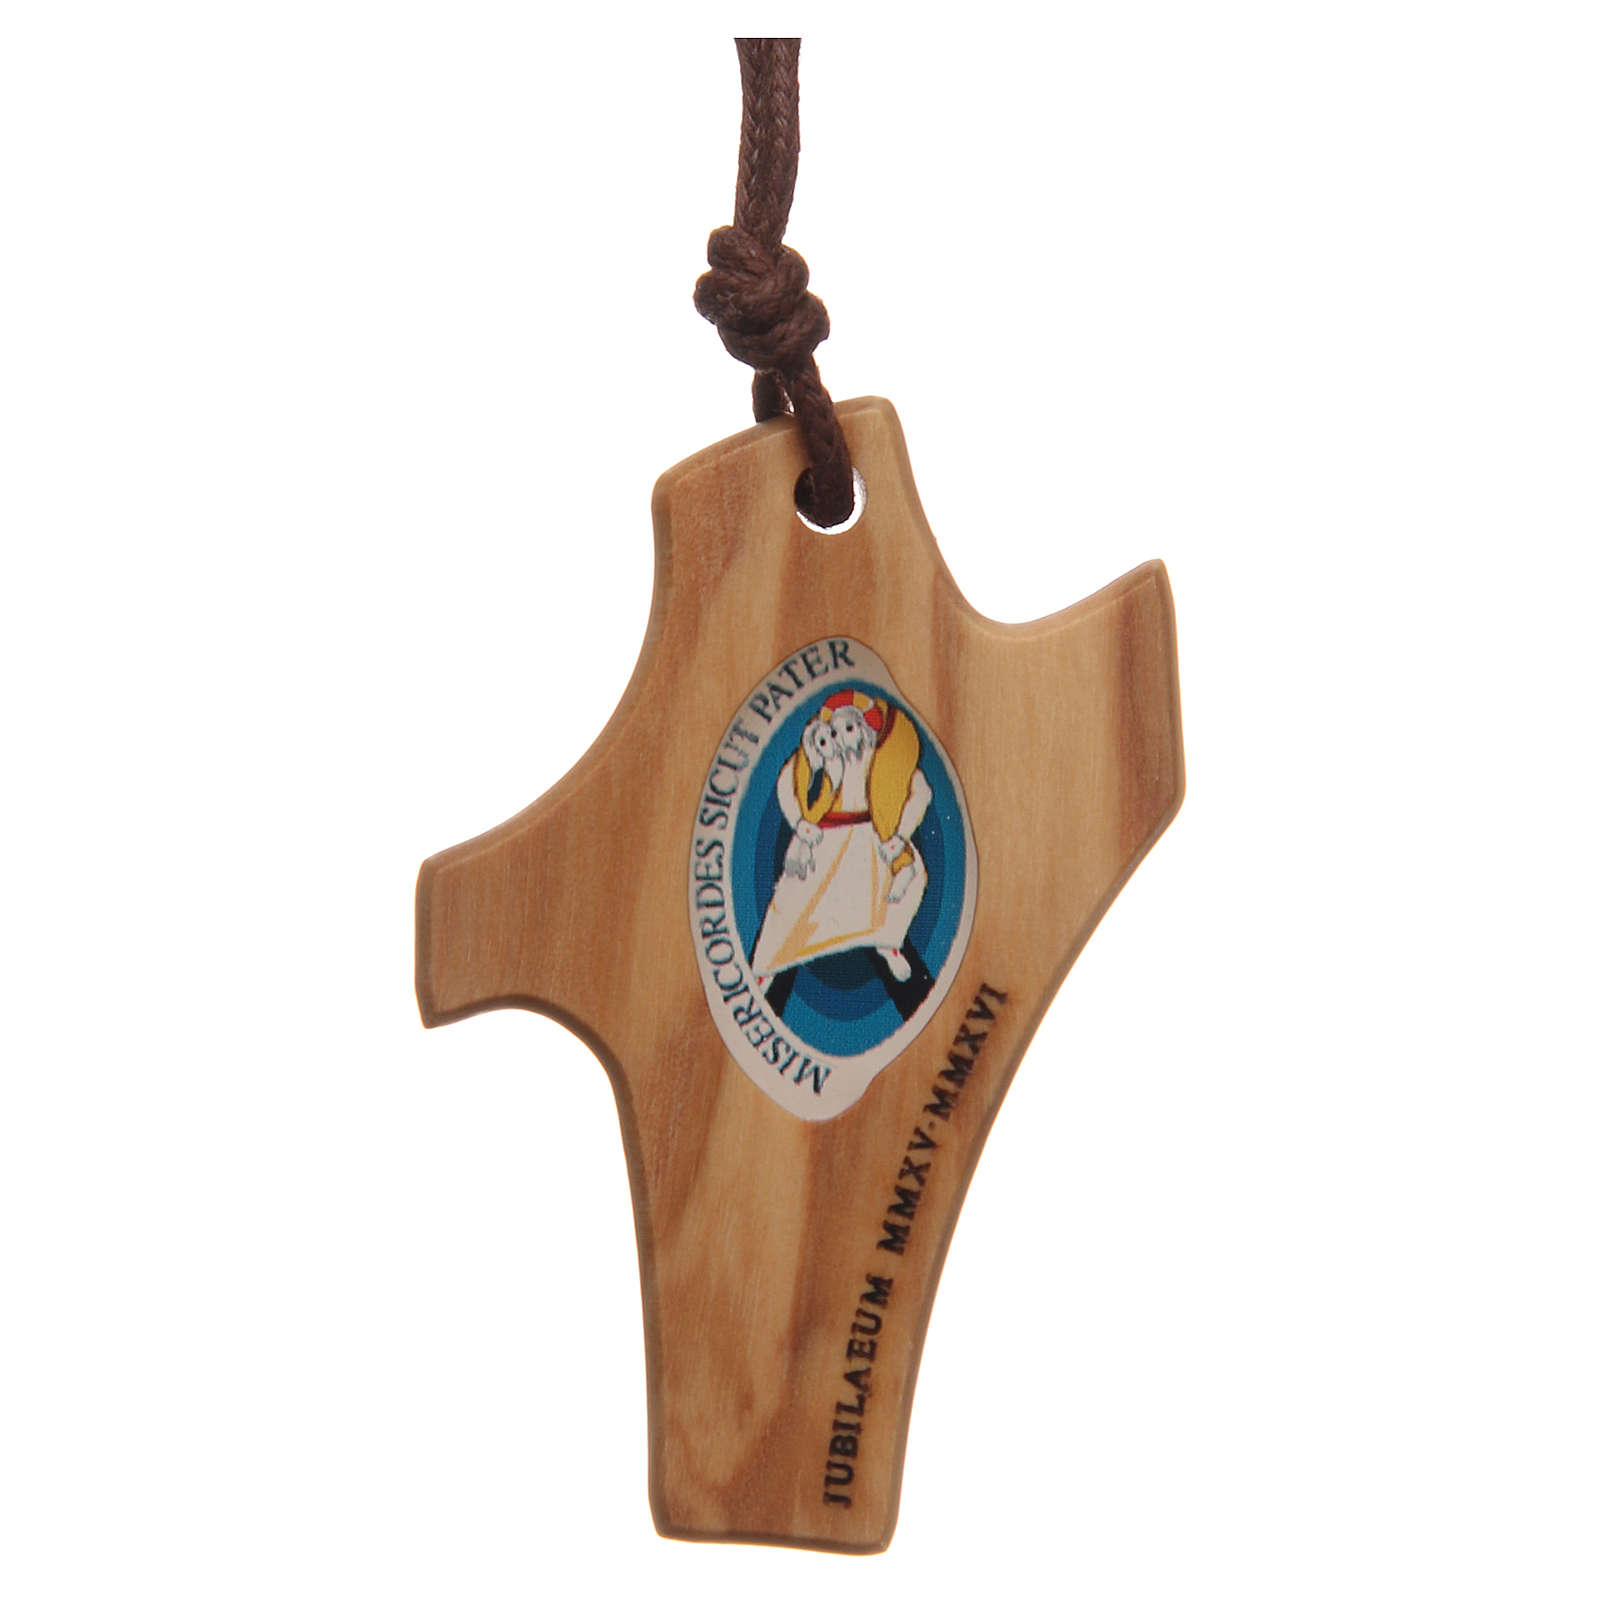 STOCK Colgante olivo cuerda logo Jubileo Misericordia 4,5x3 cm 4